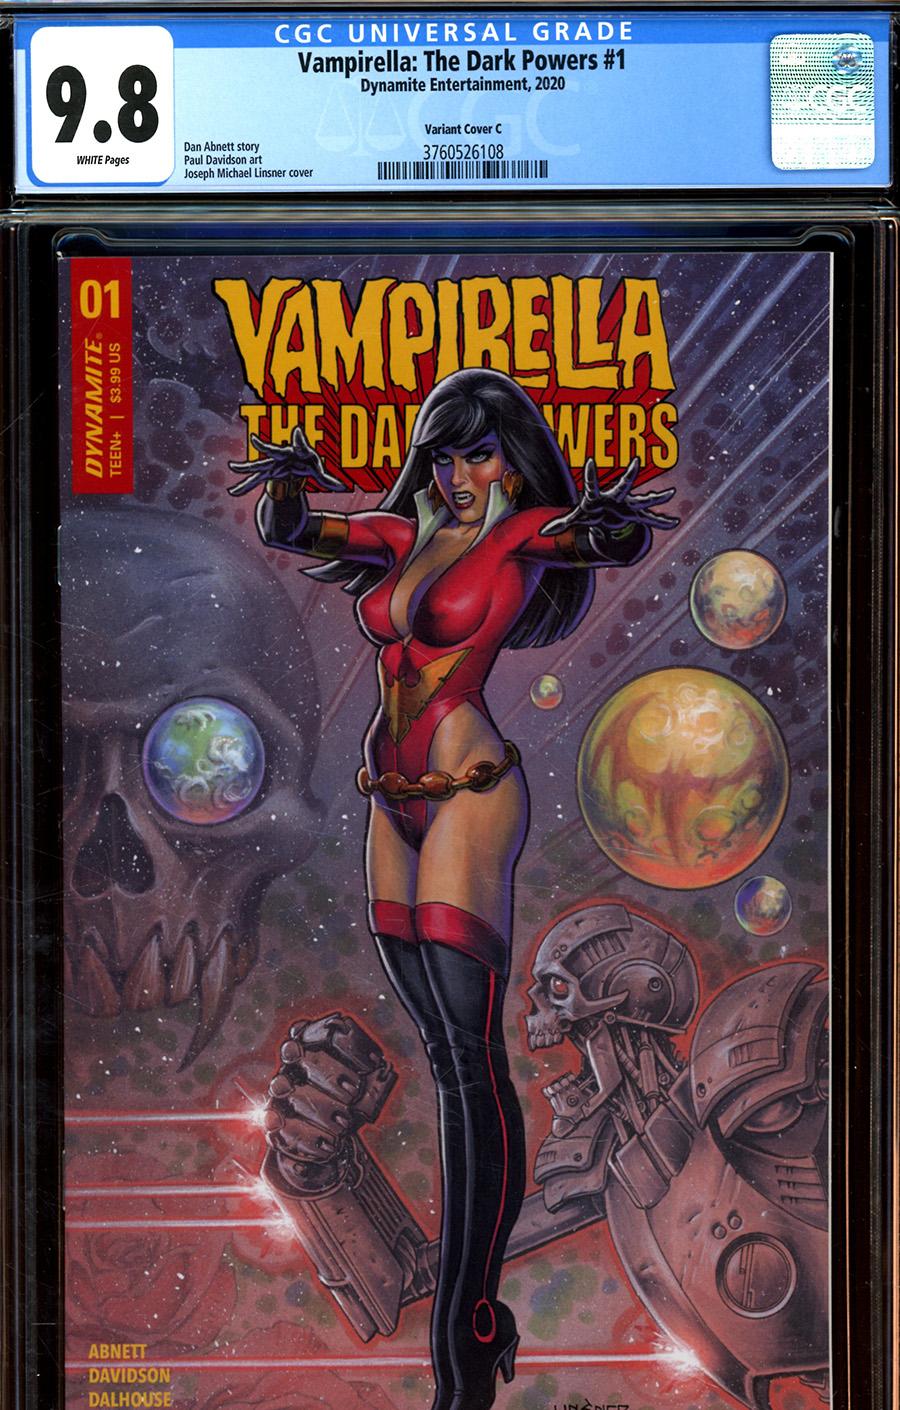 Vampirella The Dark Powers #1 Cover Z-L Variant Joseph Michael Linsner Cover CGC Graded